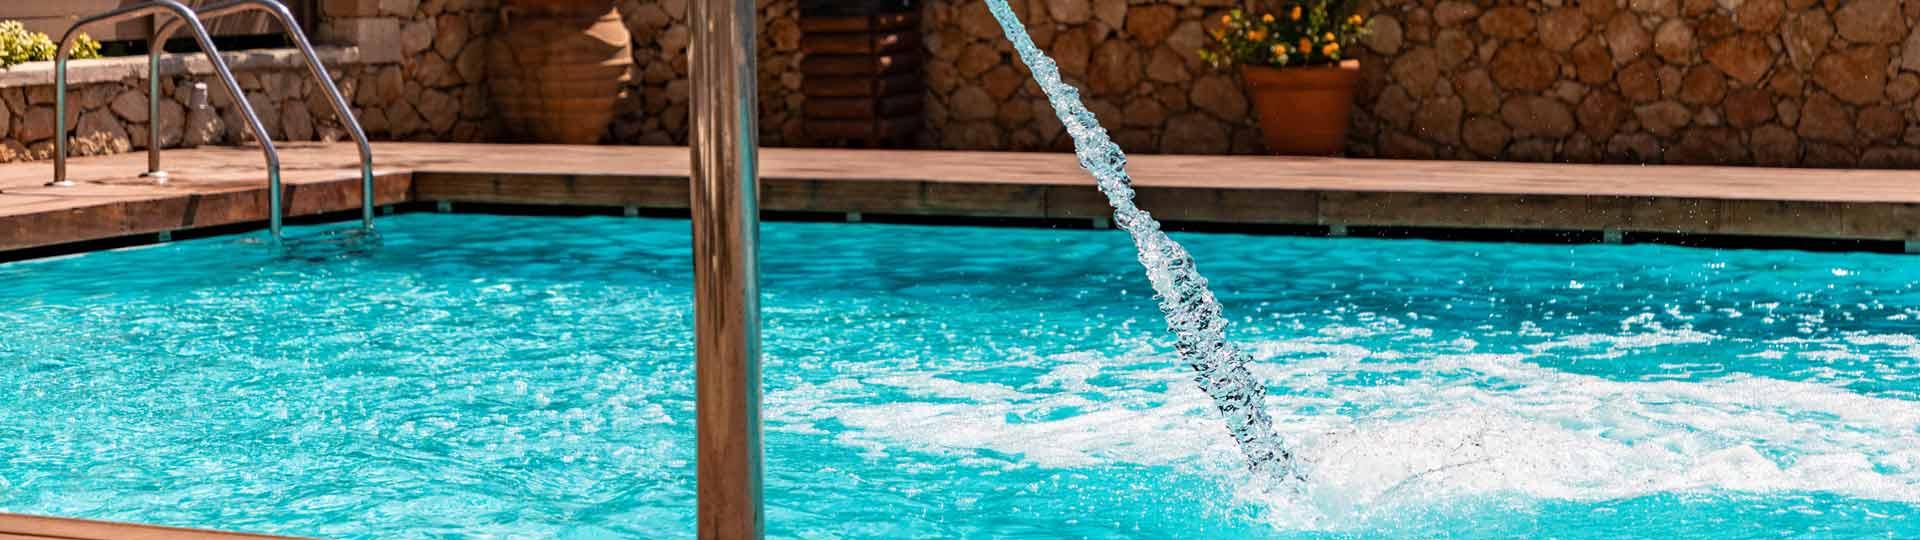 como-limpiar-agua-verde-piscina-detalle